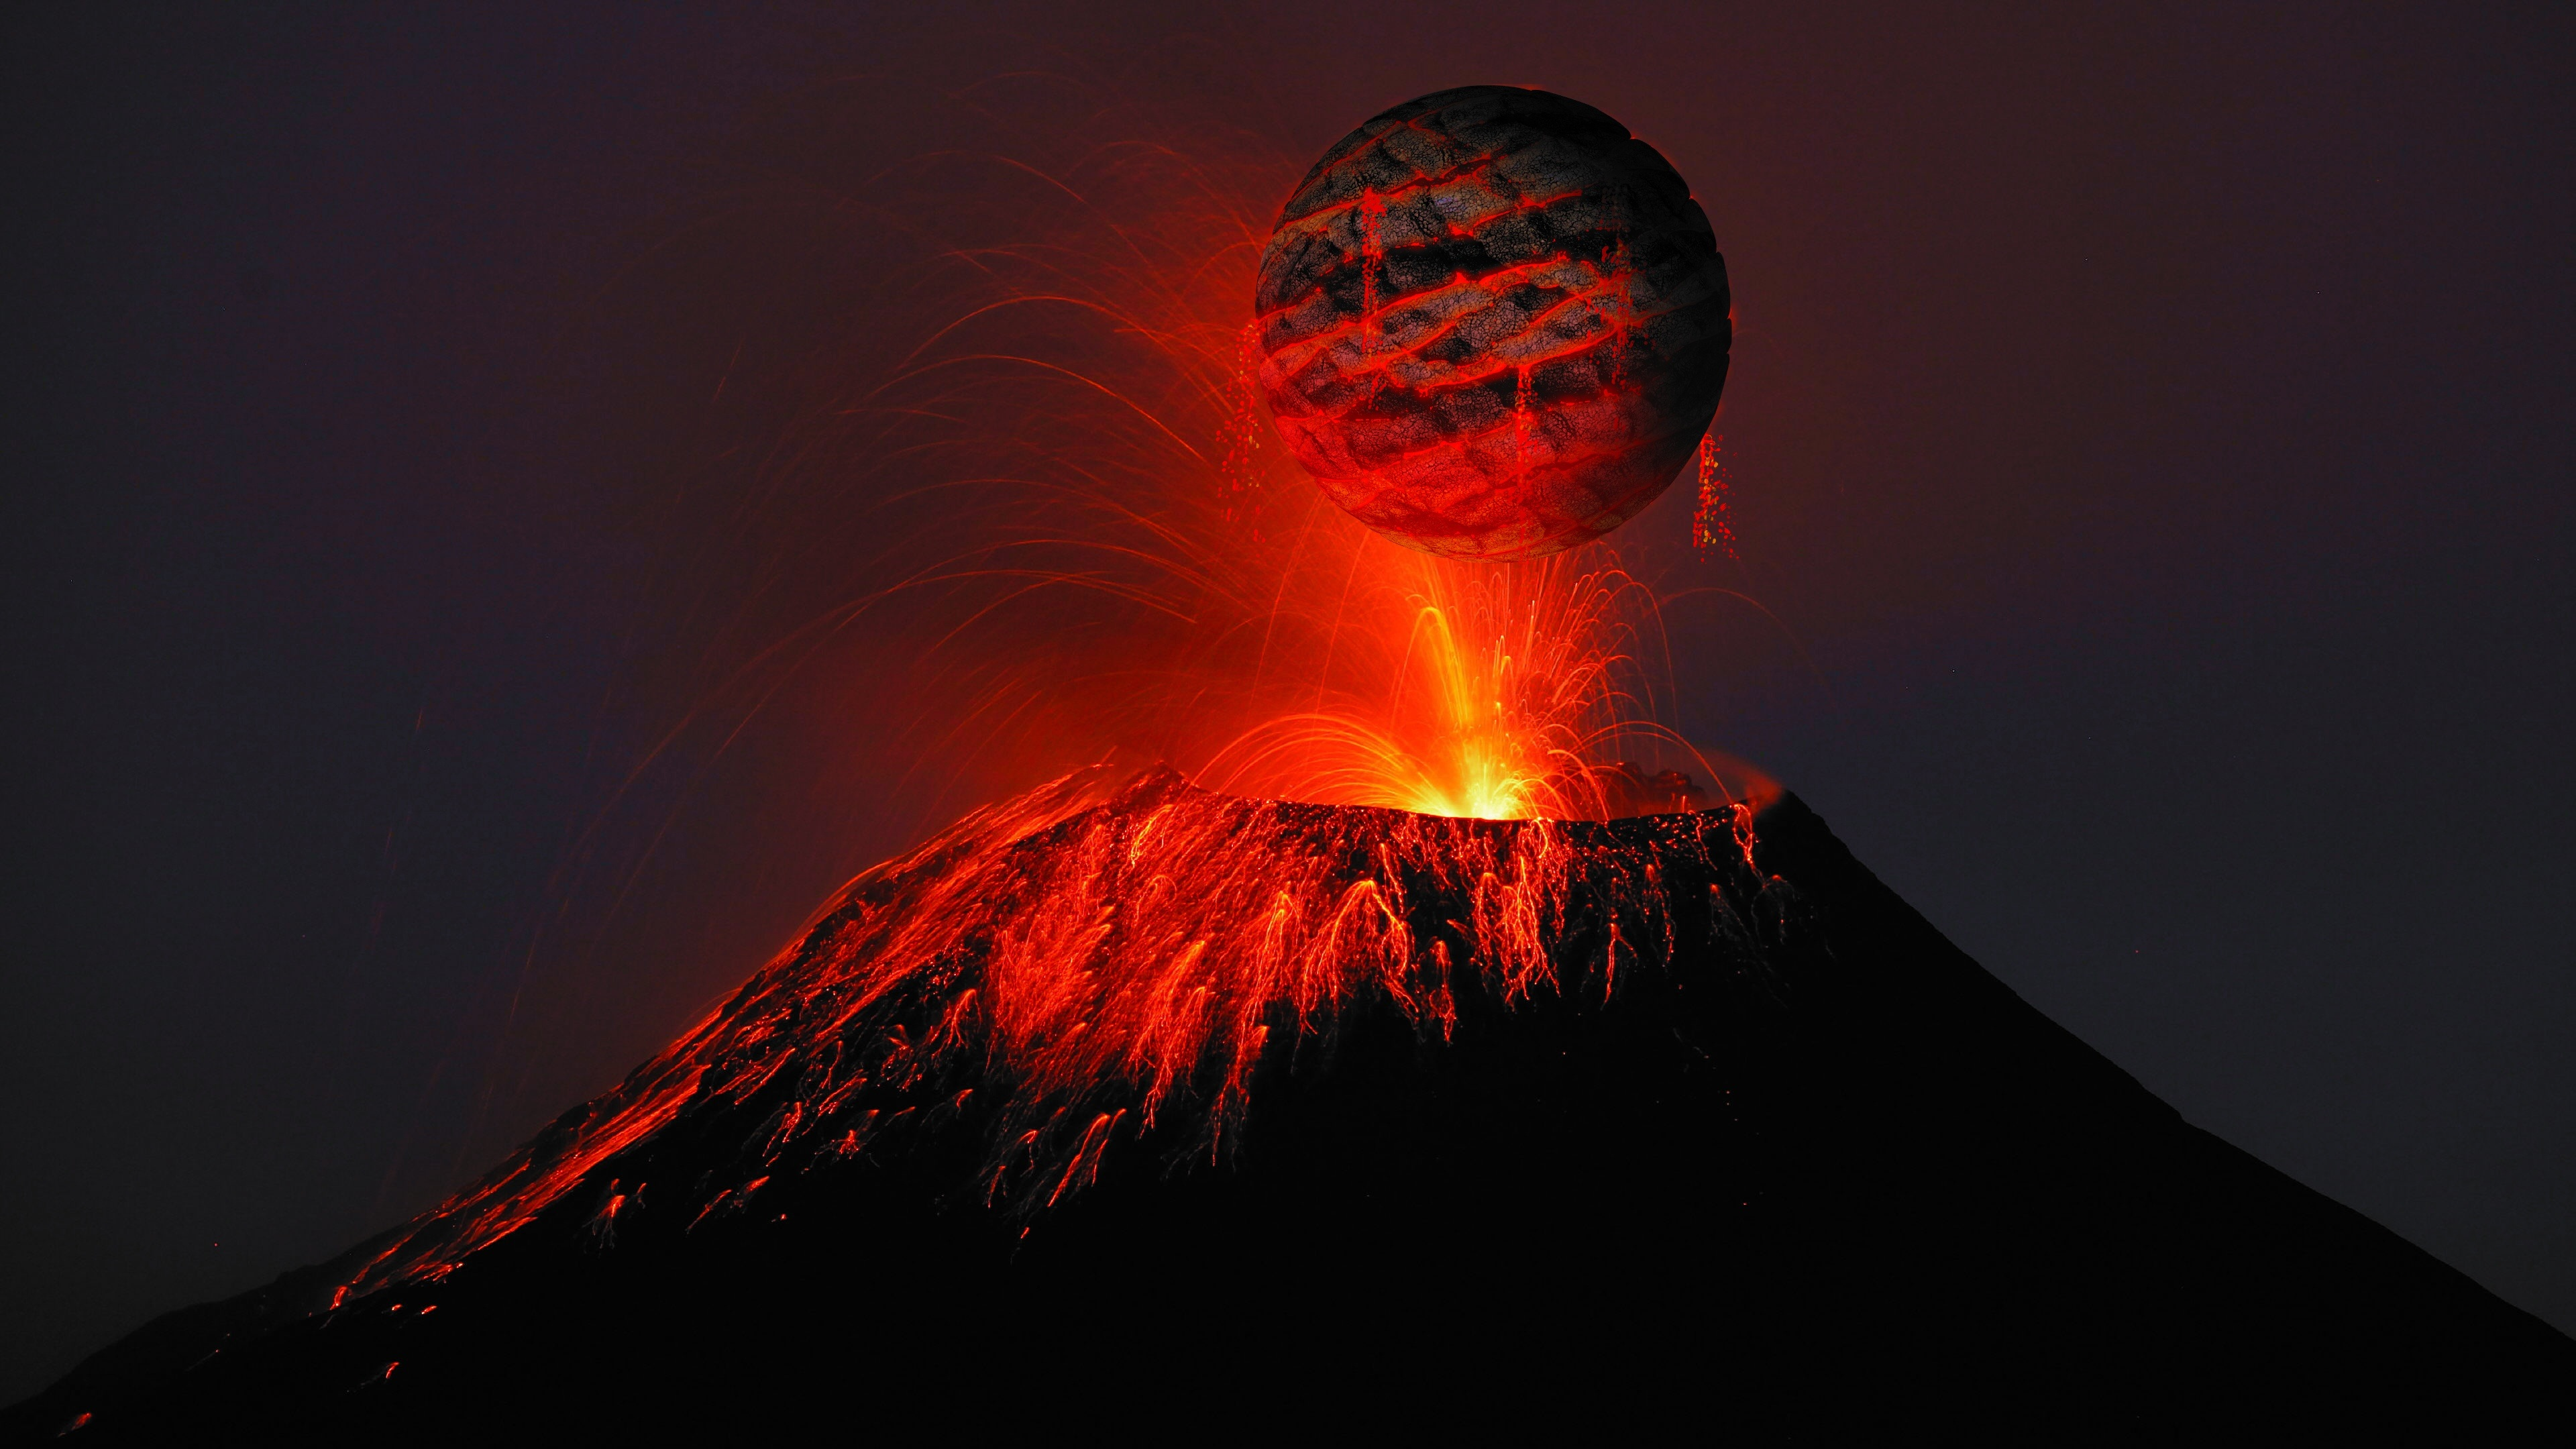 Volcano Wallpapers Hd: 2560x1440 Volcano Lava 4k 1440P Resolution HD 4k